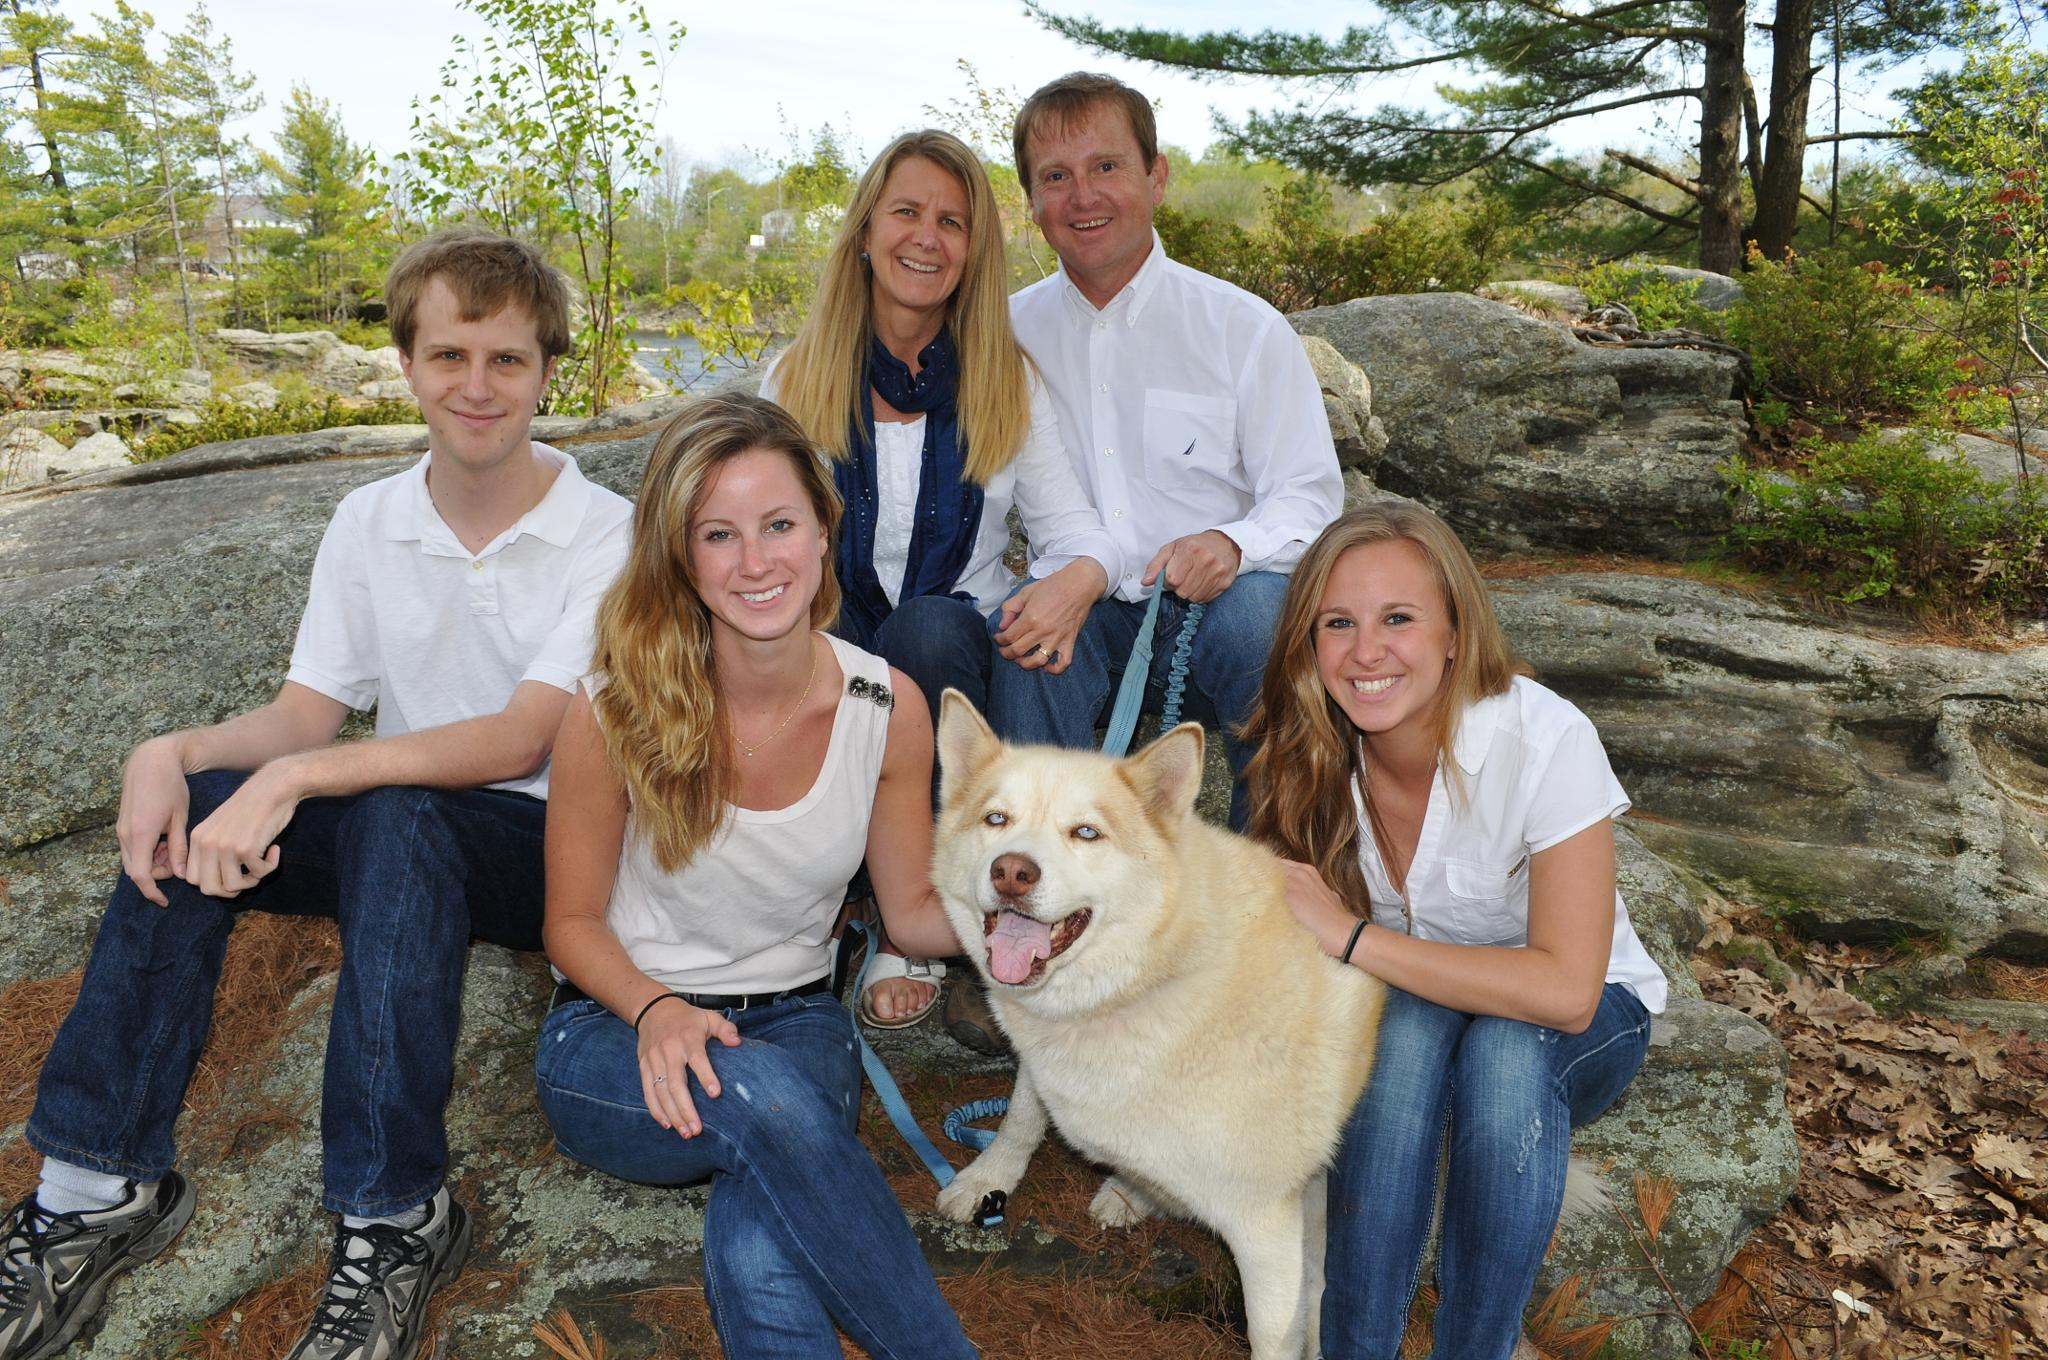 Favorite Family by Kerri L. Bickford